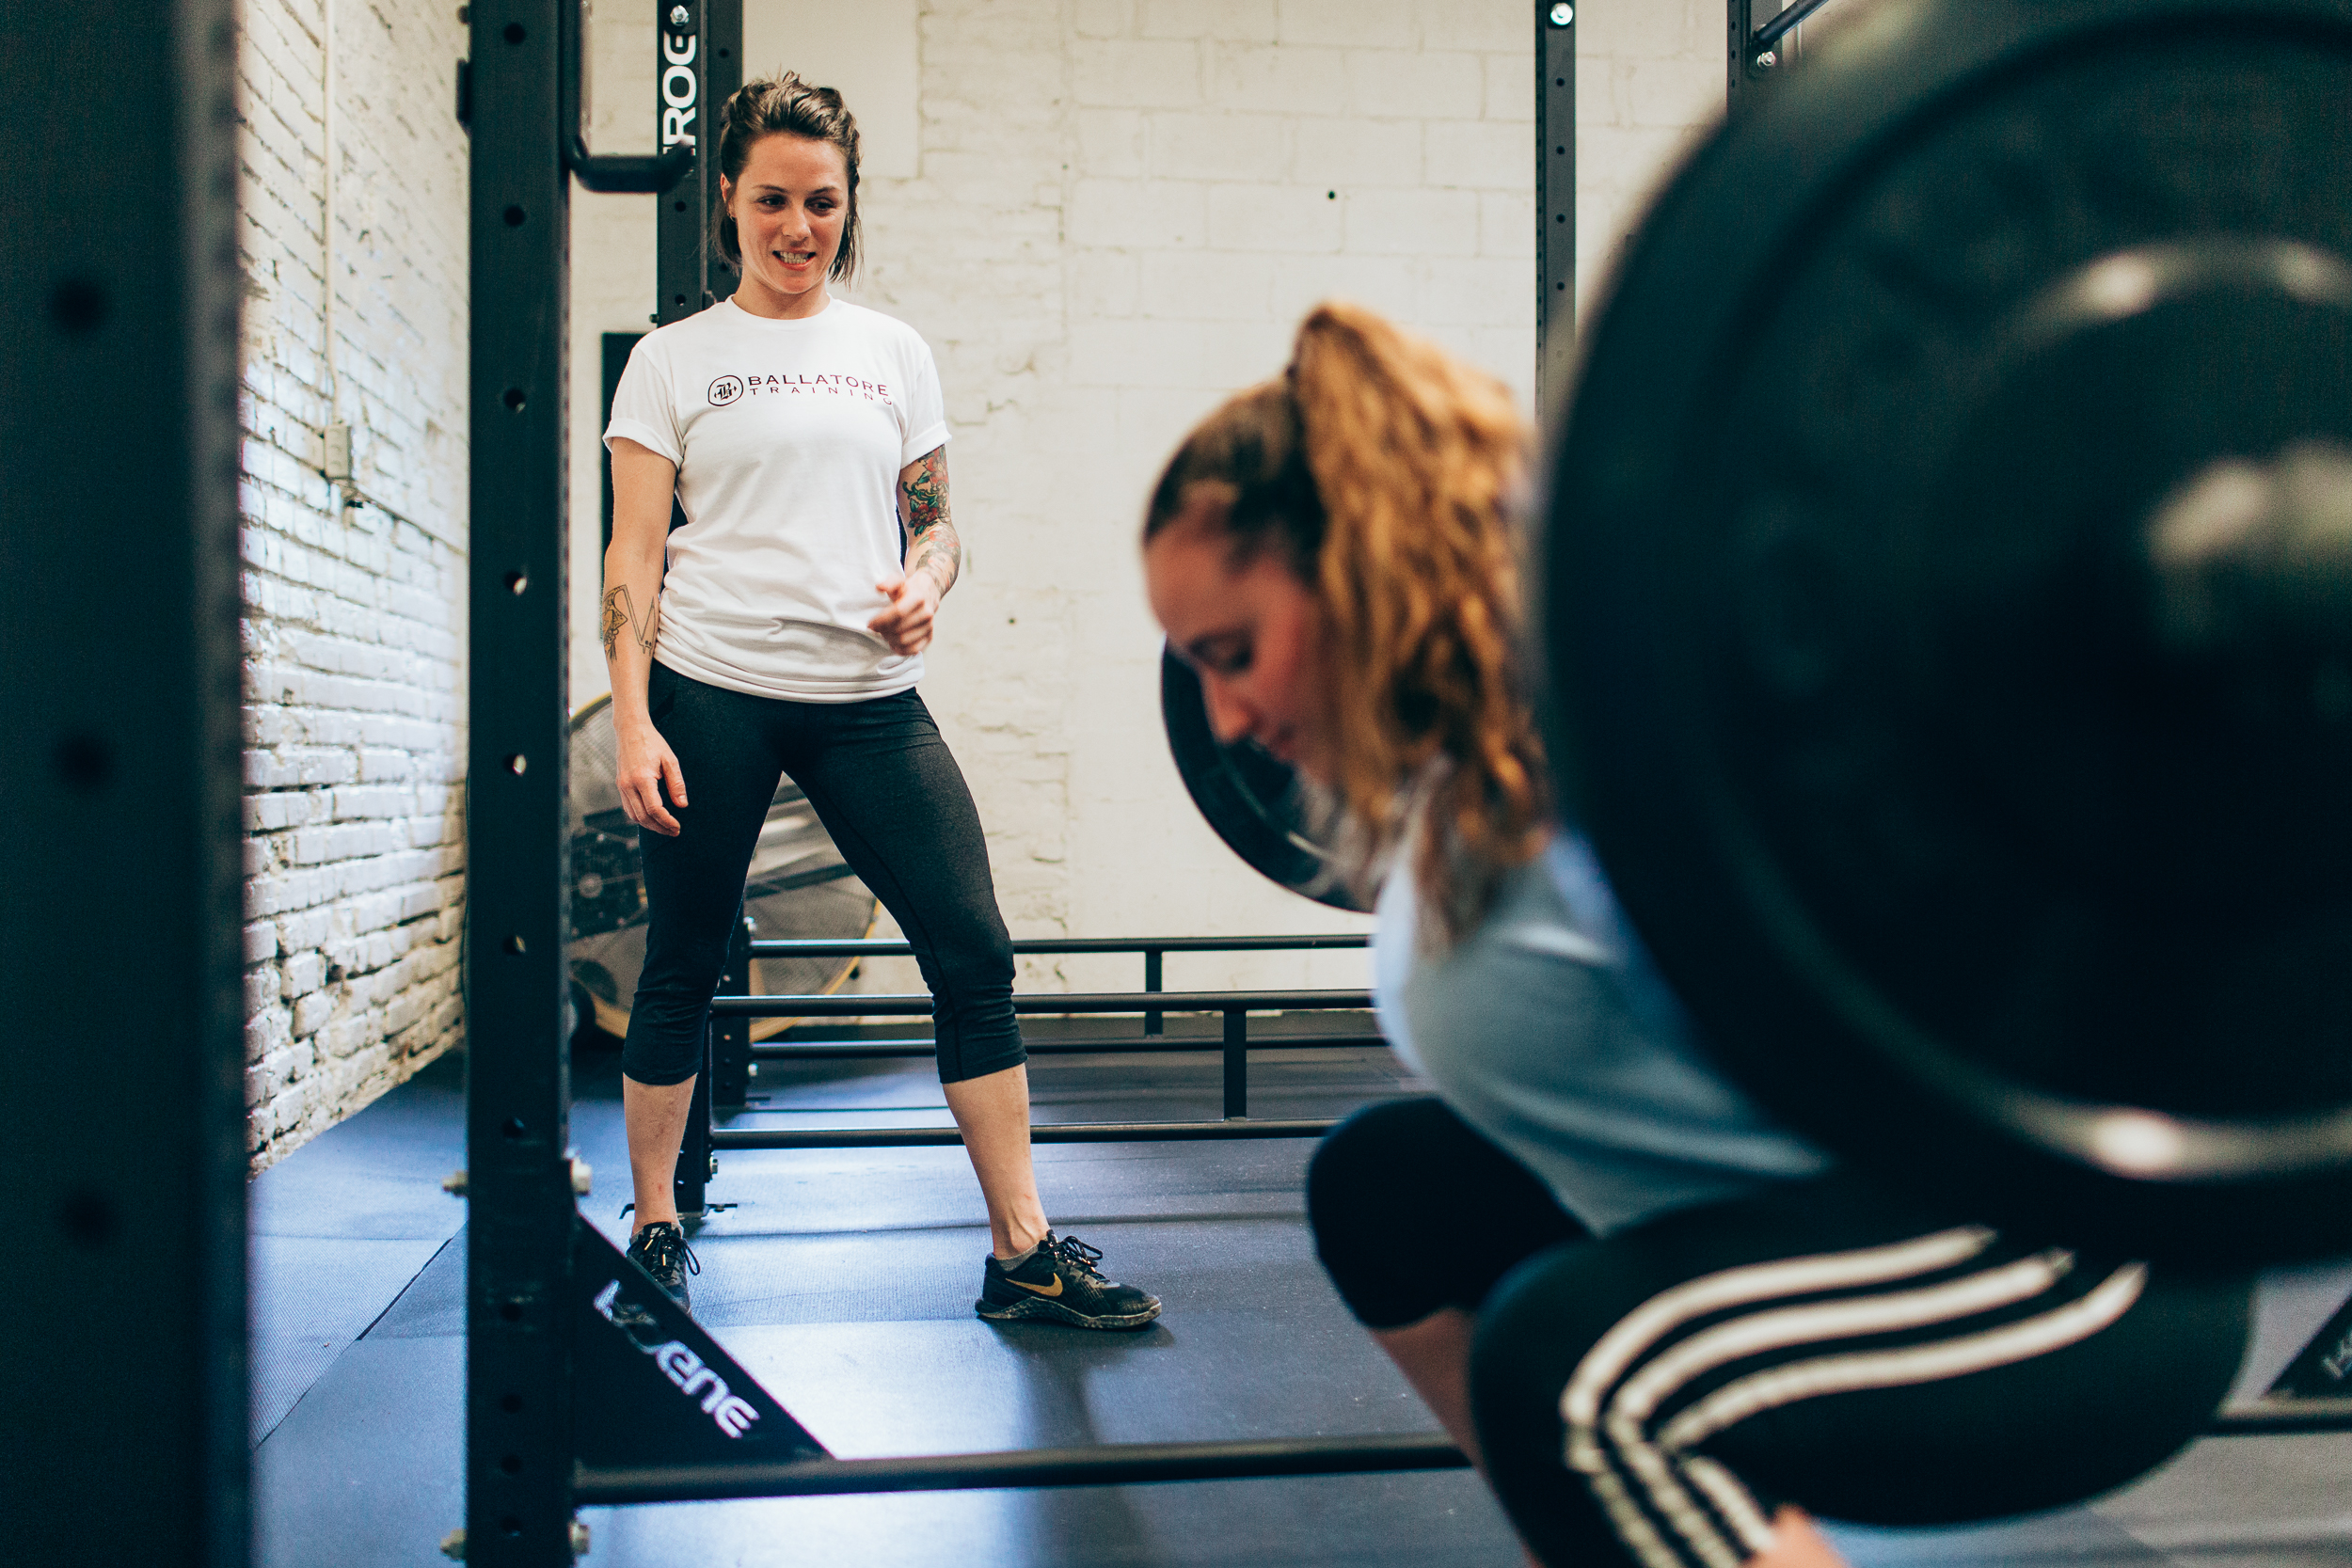 Coaching the Back Squat